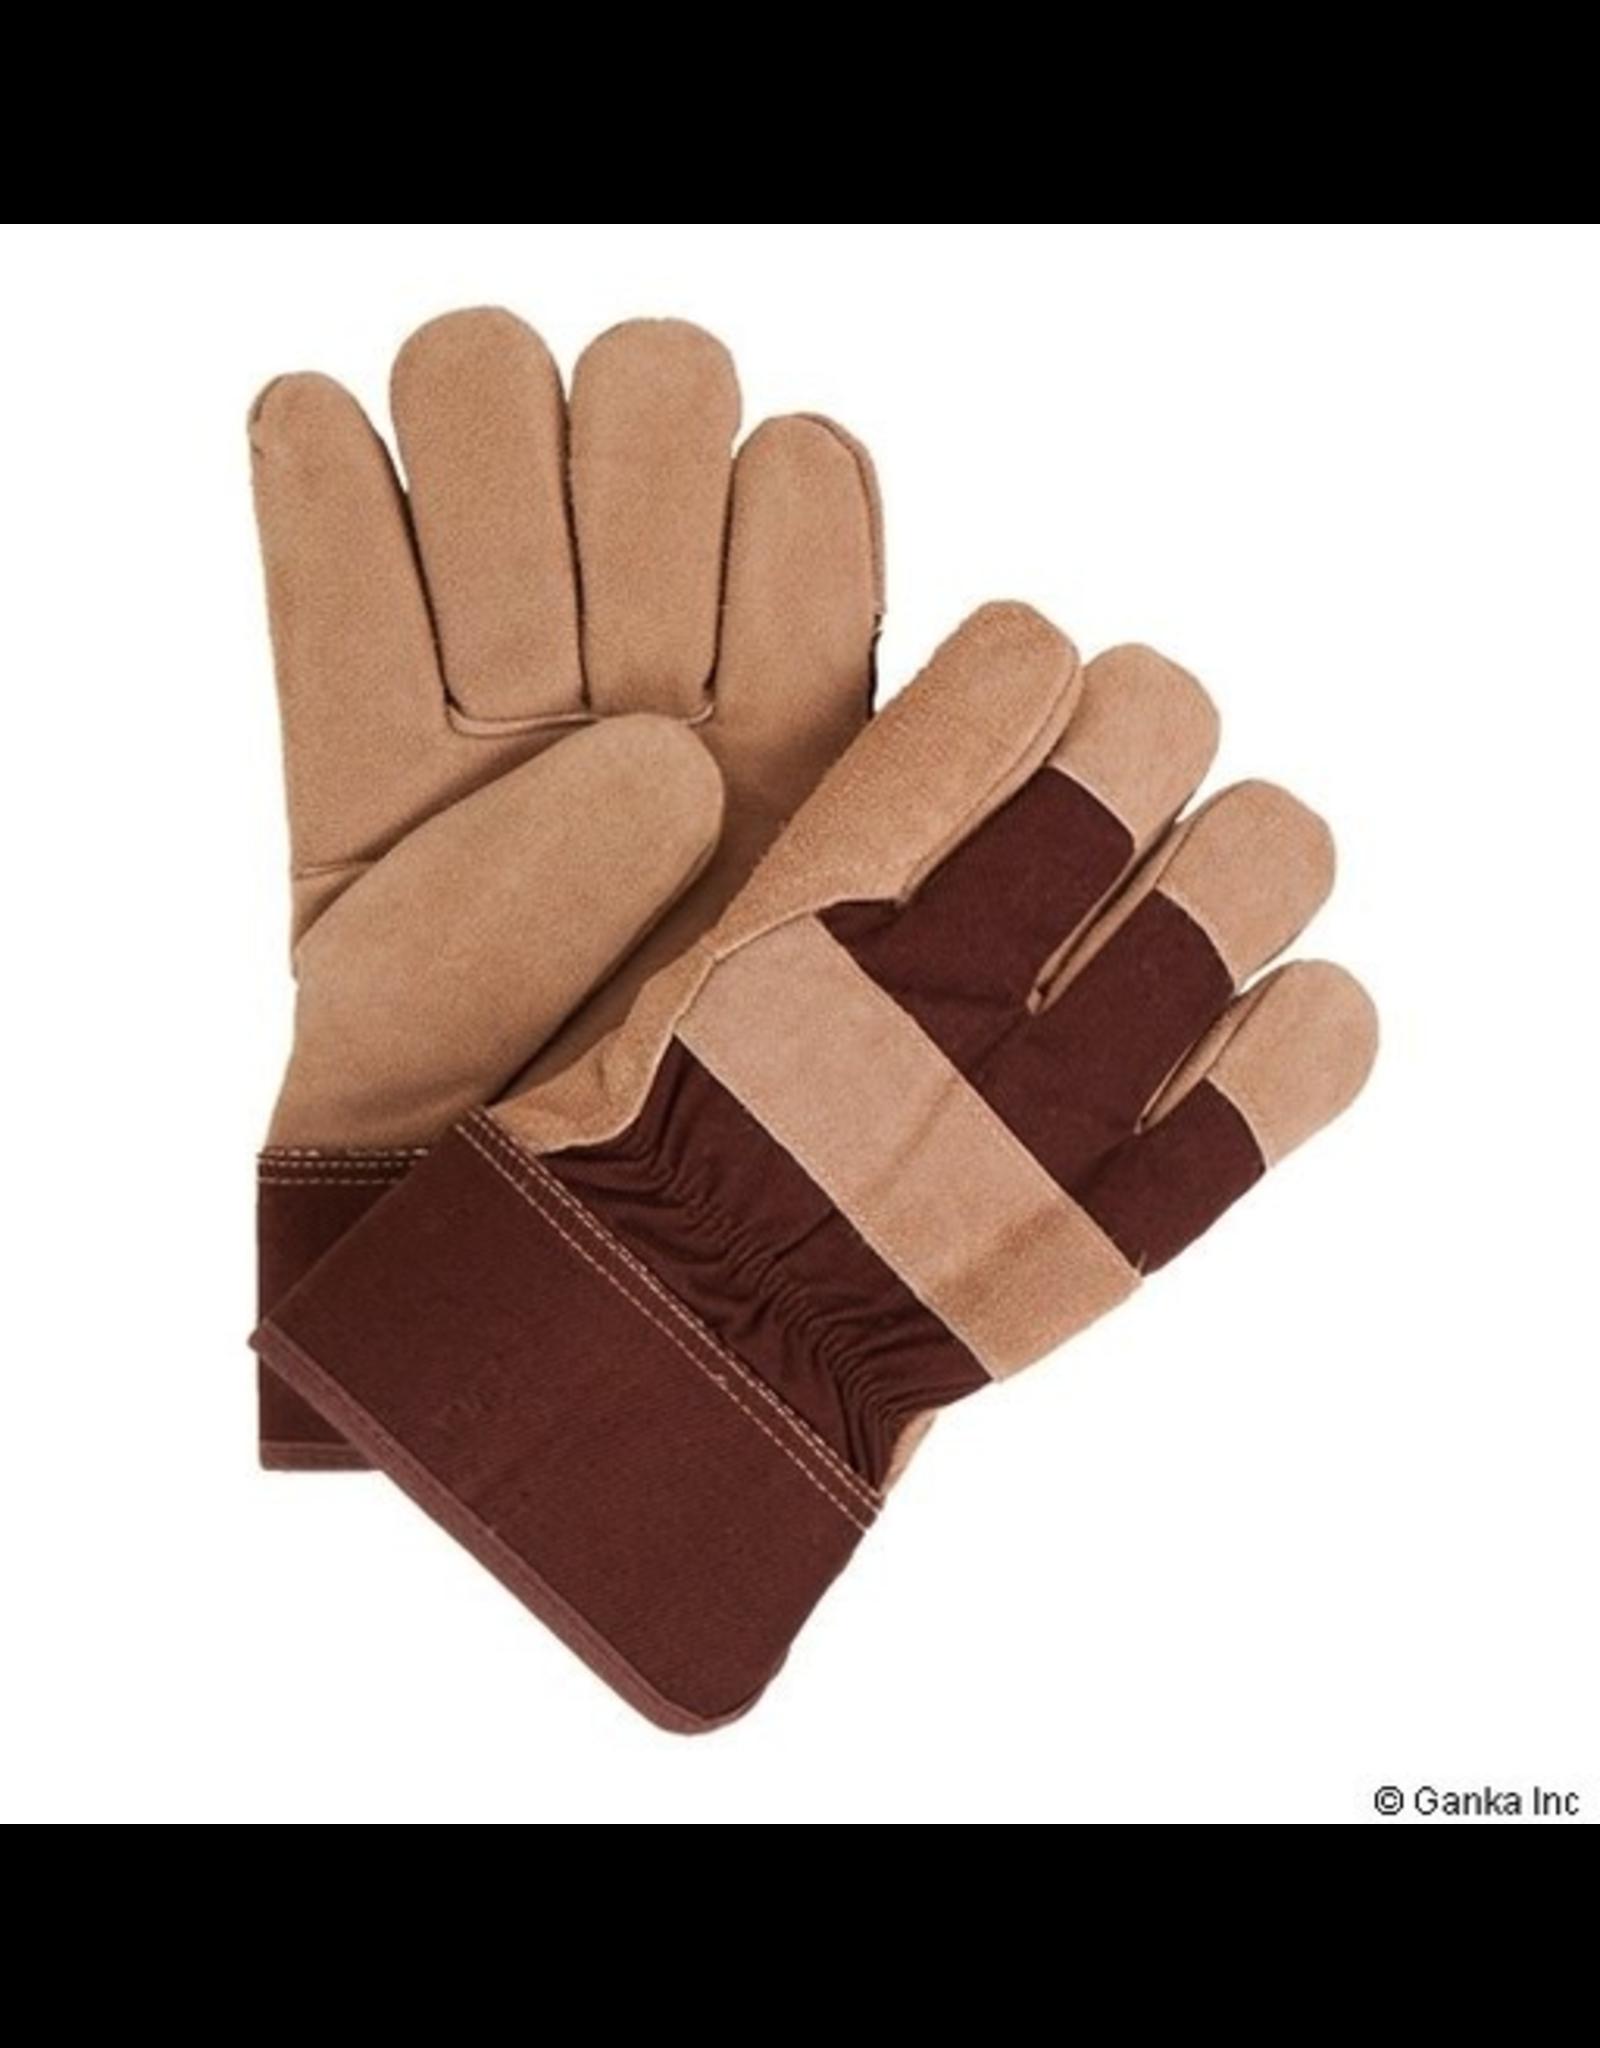 GKS GKS Cowsplit Boa PVC/Solid Rubber Work Glove